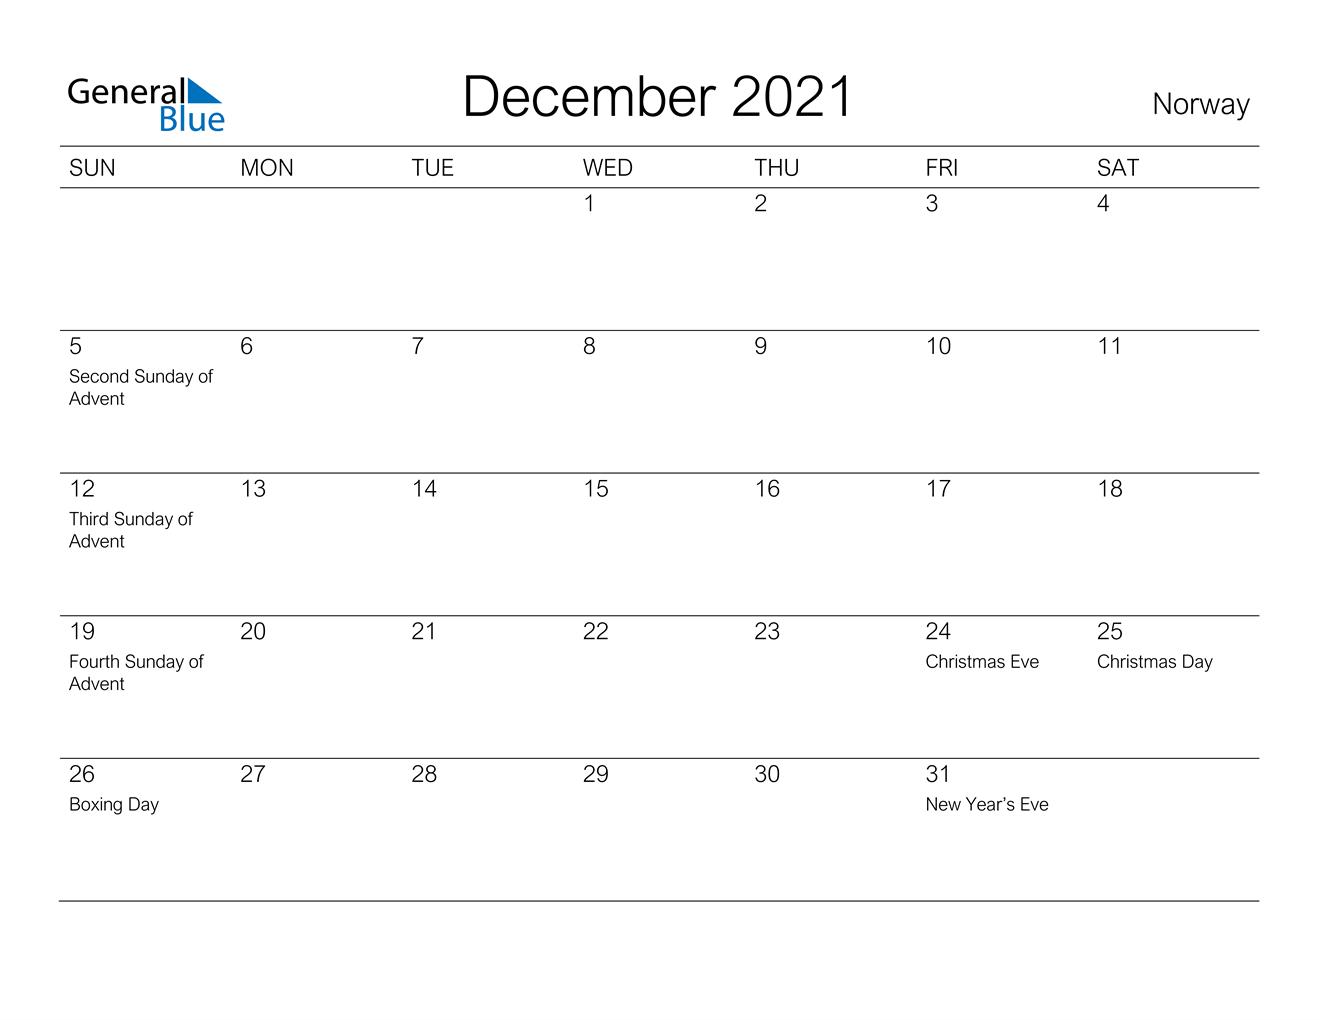 December 2021 Calendar Norway